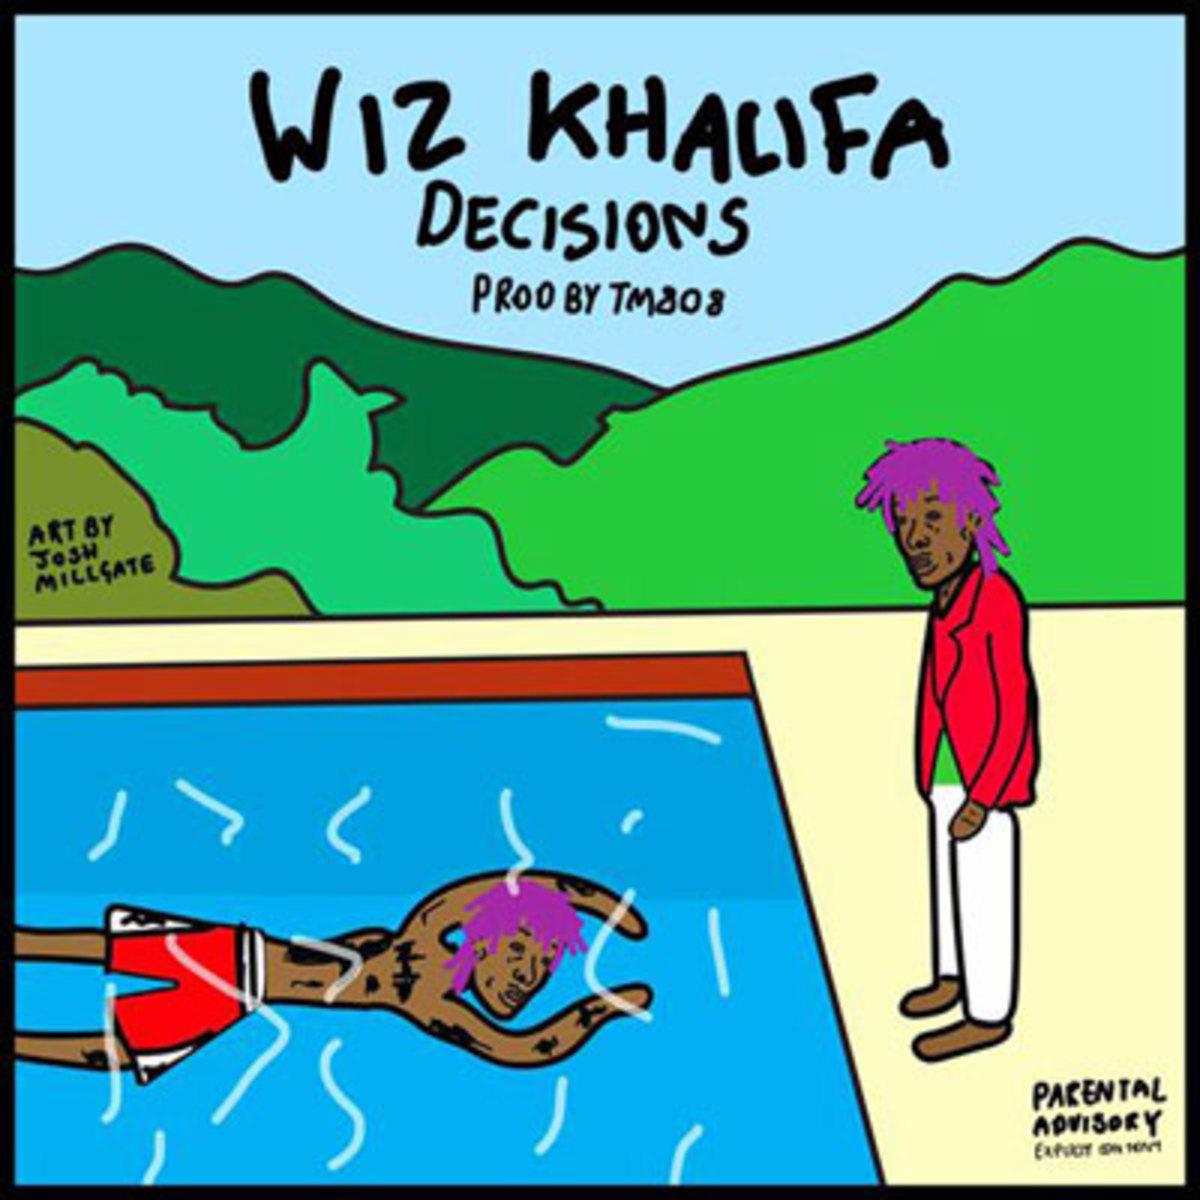 wizkhalifa-decisions.jpg